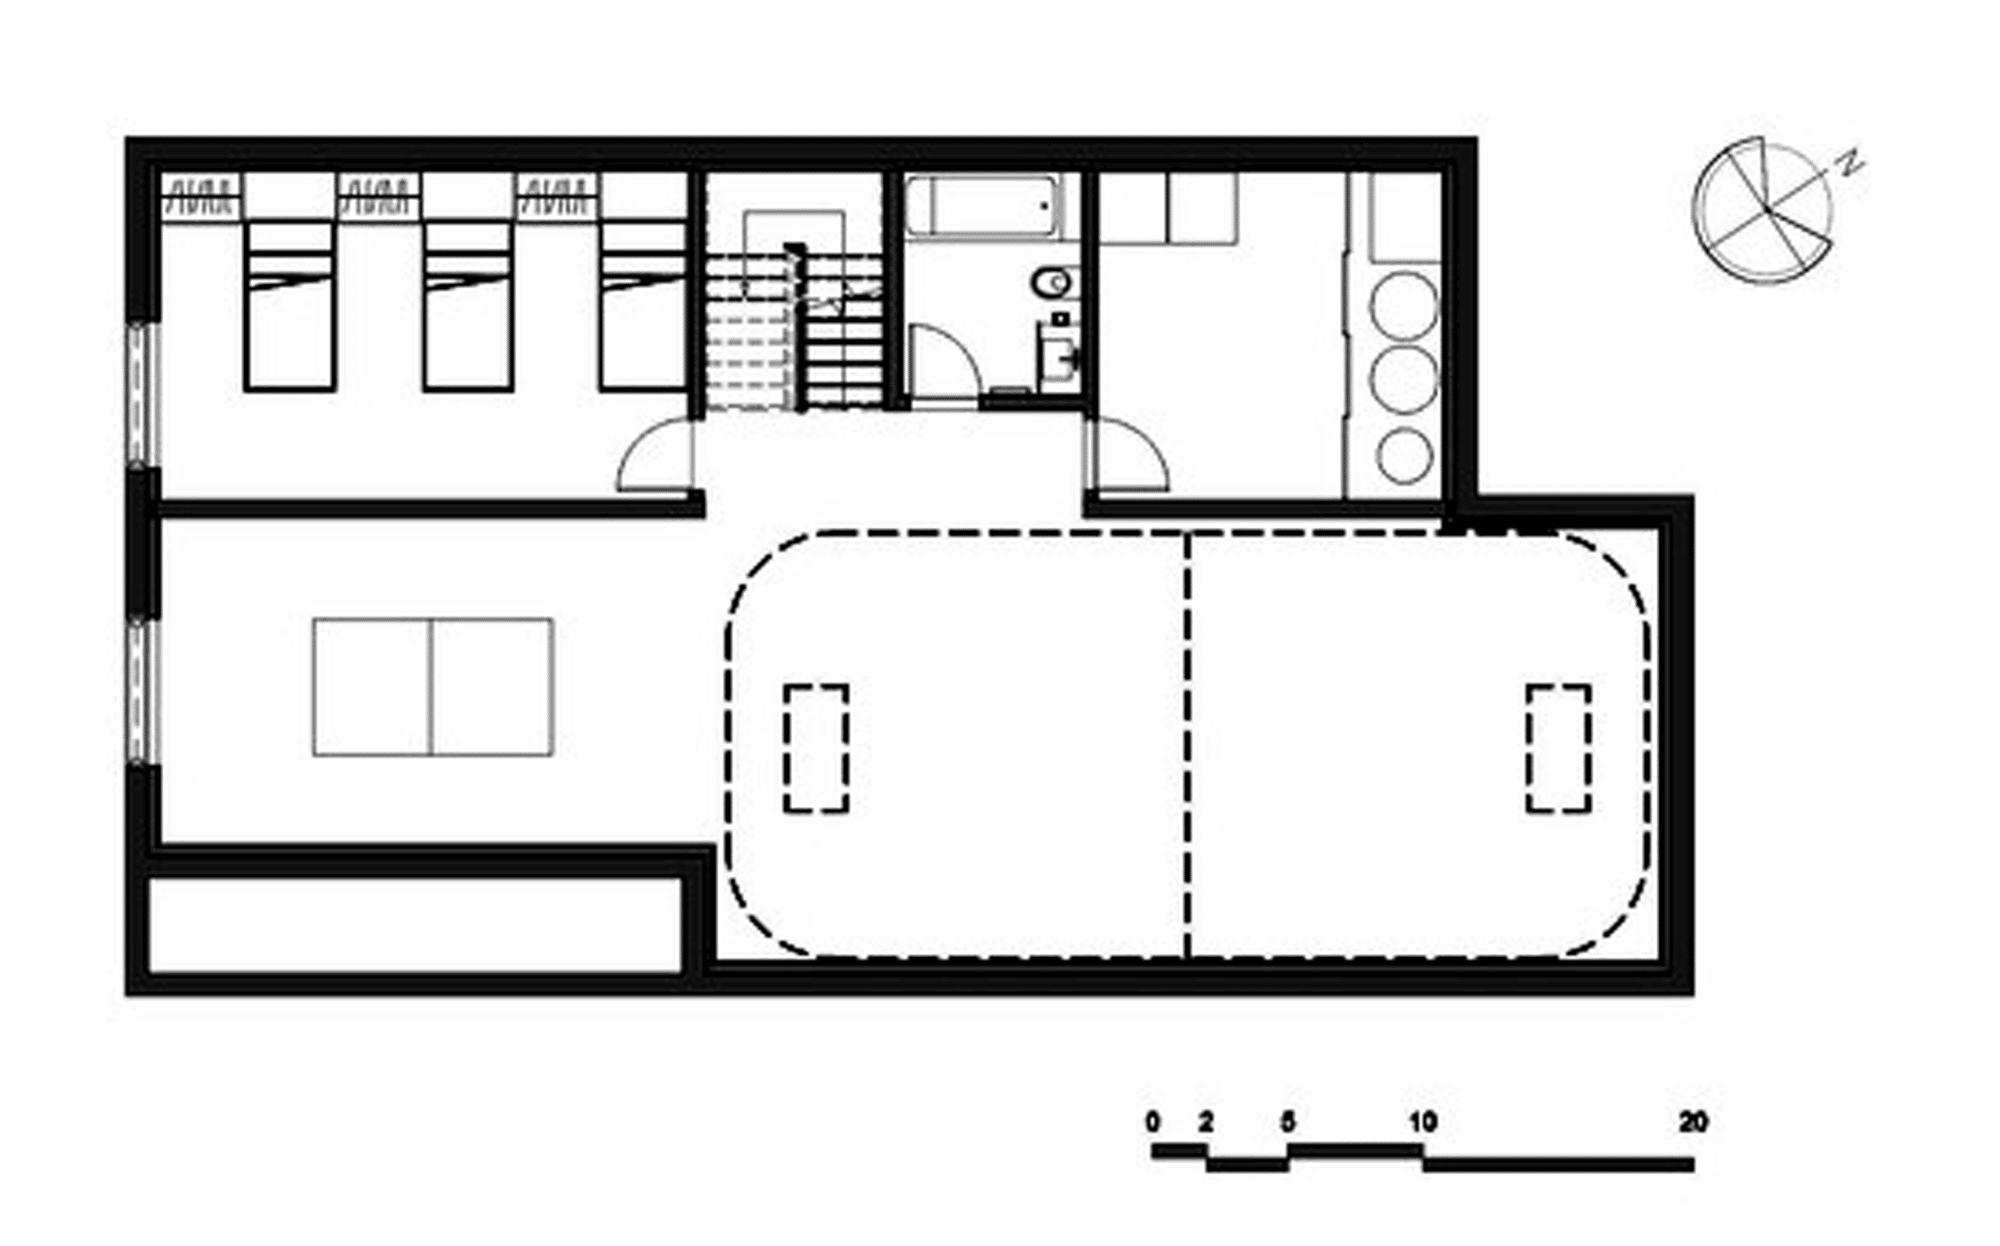 Dise o de casa moderna de dos pisos m s s tano planos for Planos planos de casas